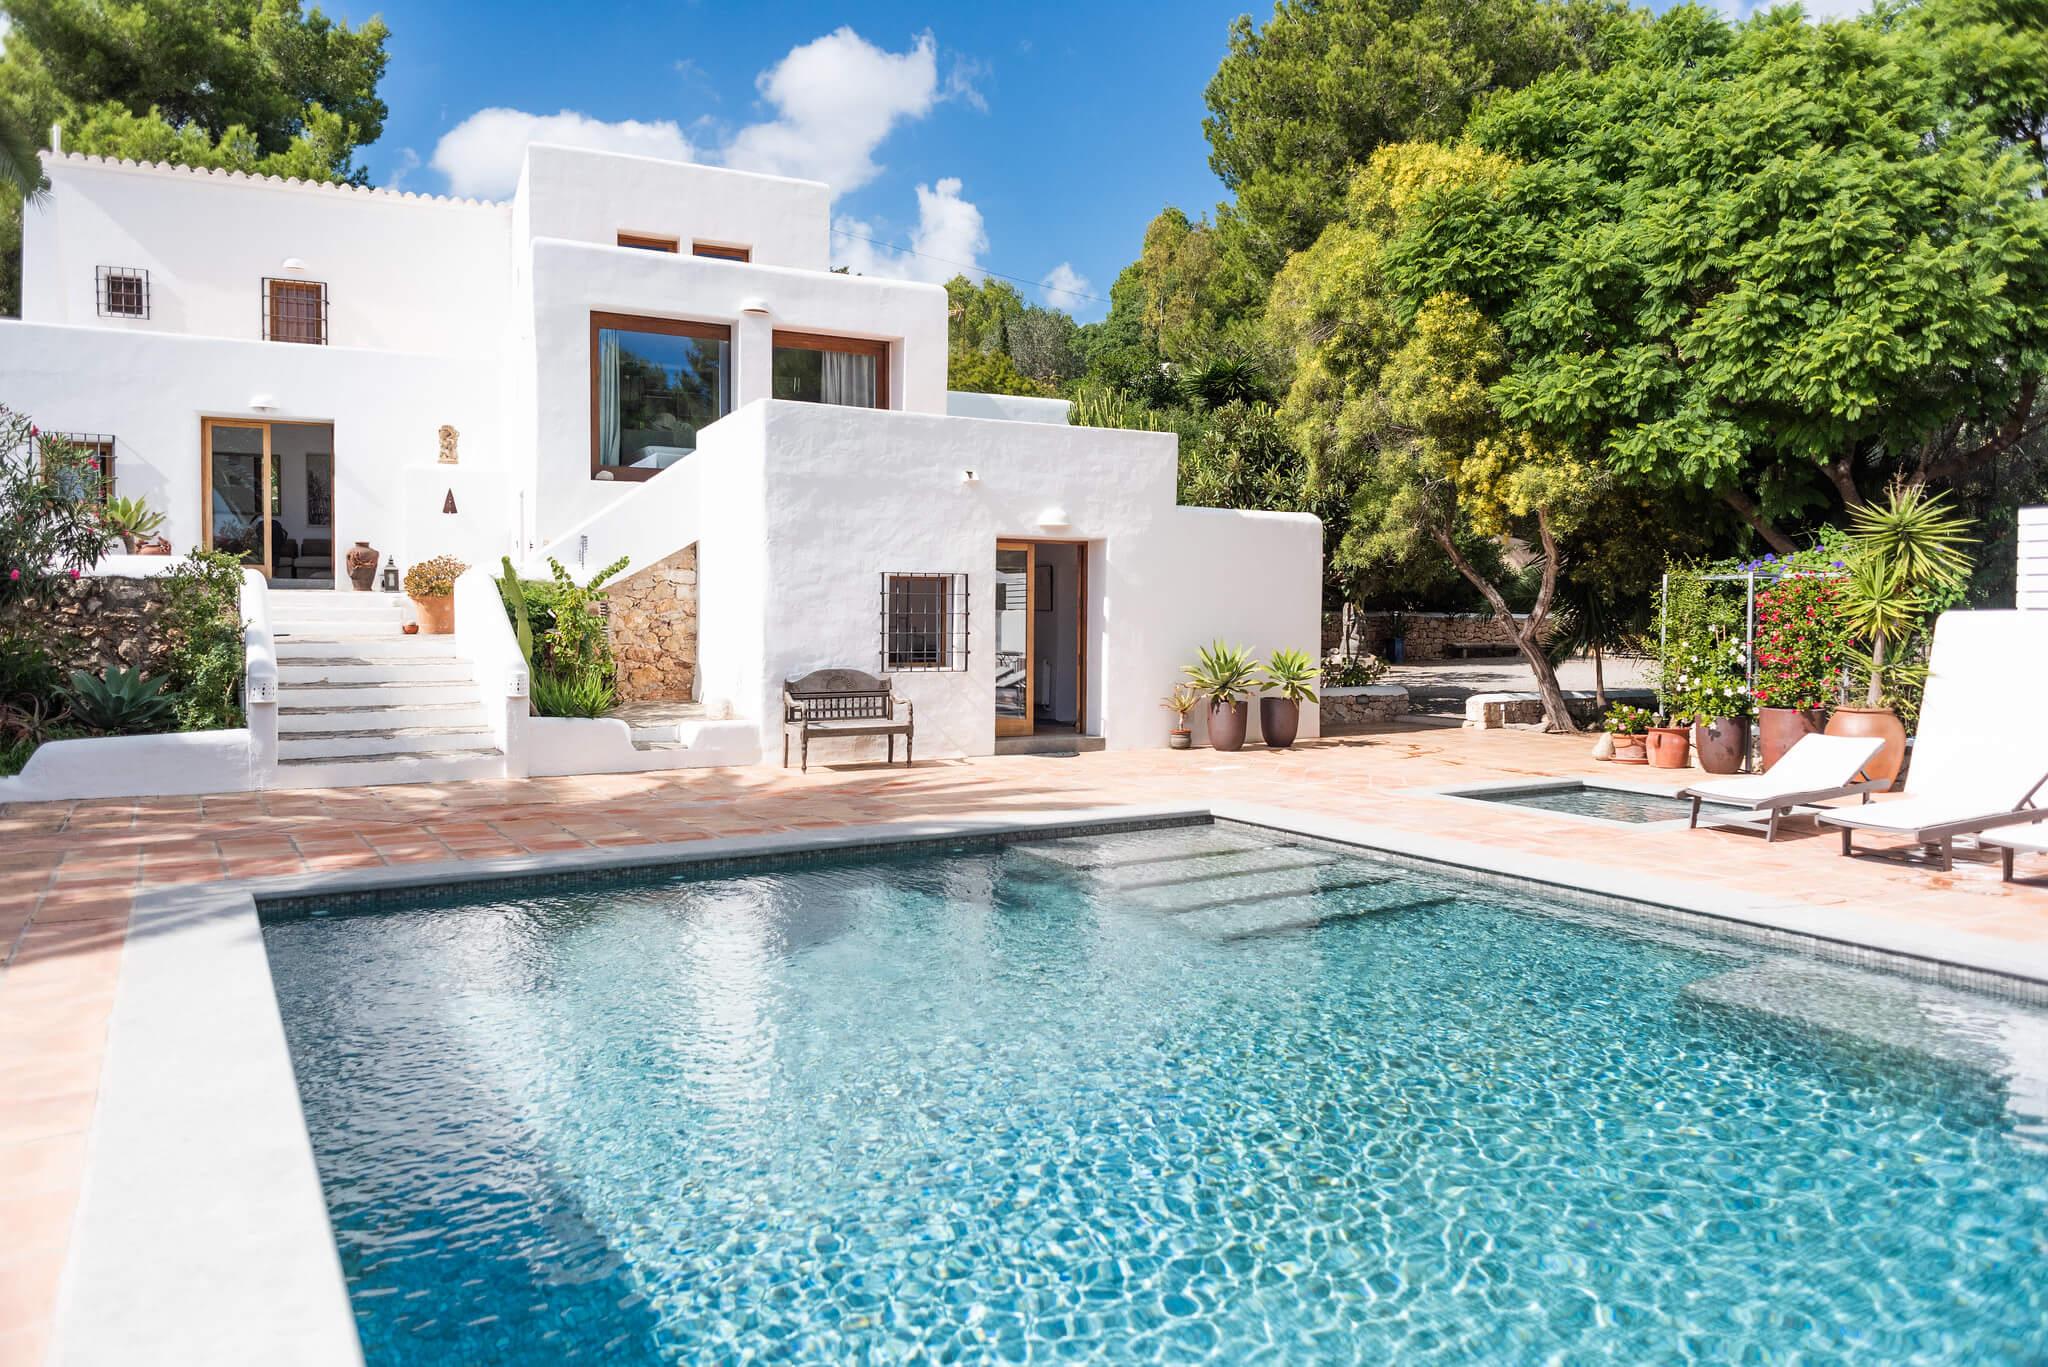 https://www.white-ibiza.com/wp-content/uploads/2020/05/white-ibiza-villas-can-lyra-exterior.jpg